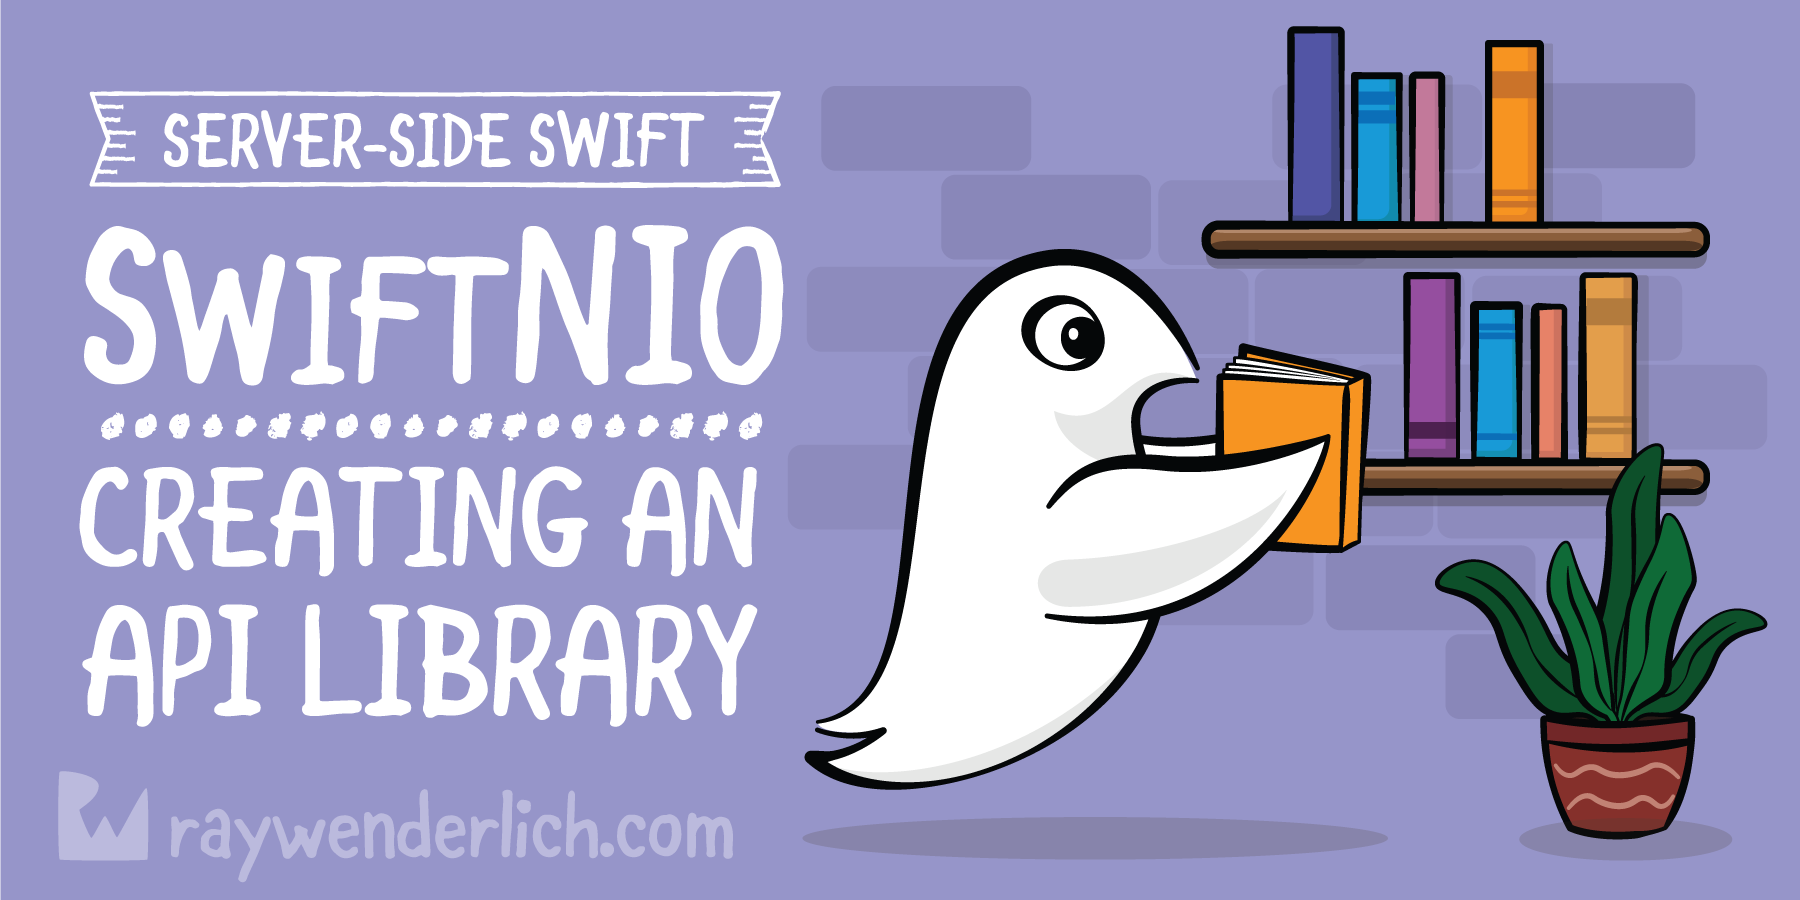 Creating an API Helper Library for SwiftNIO